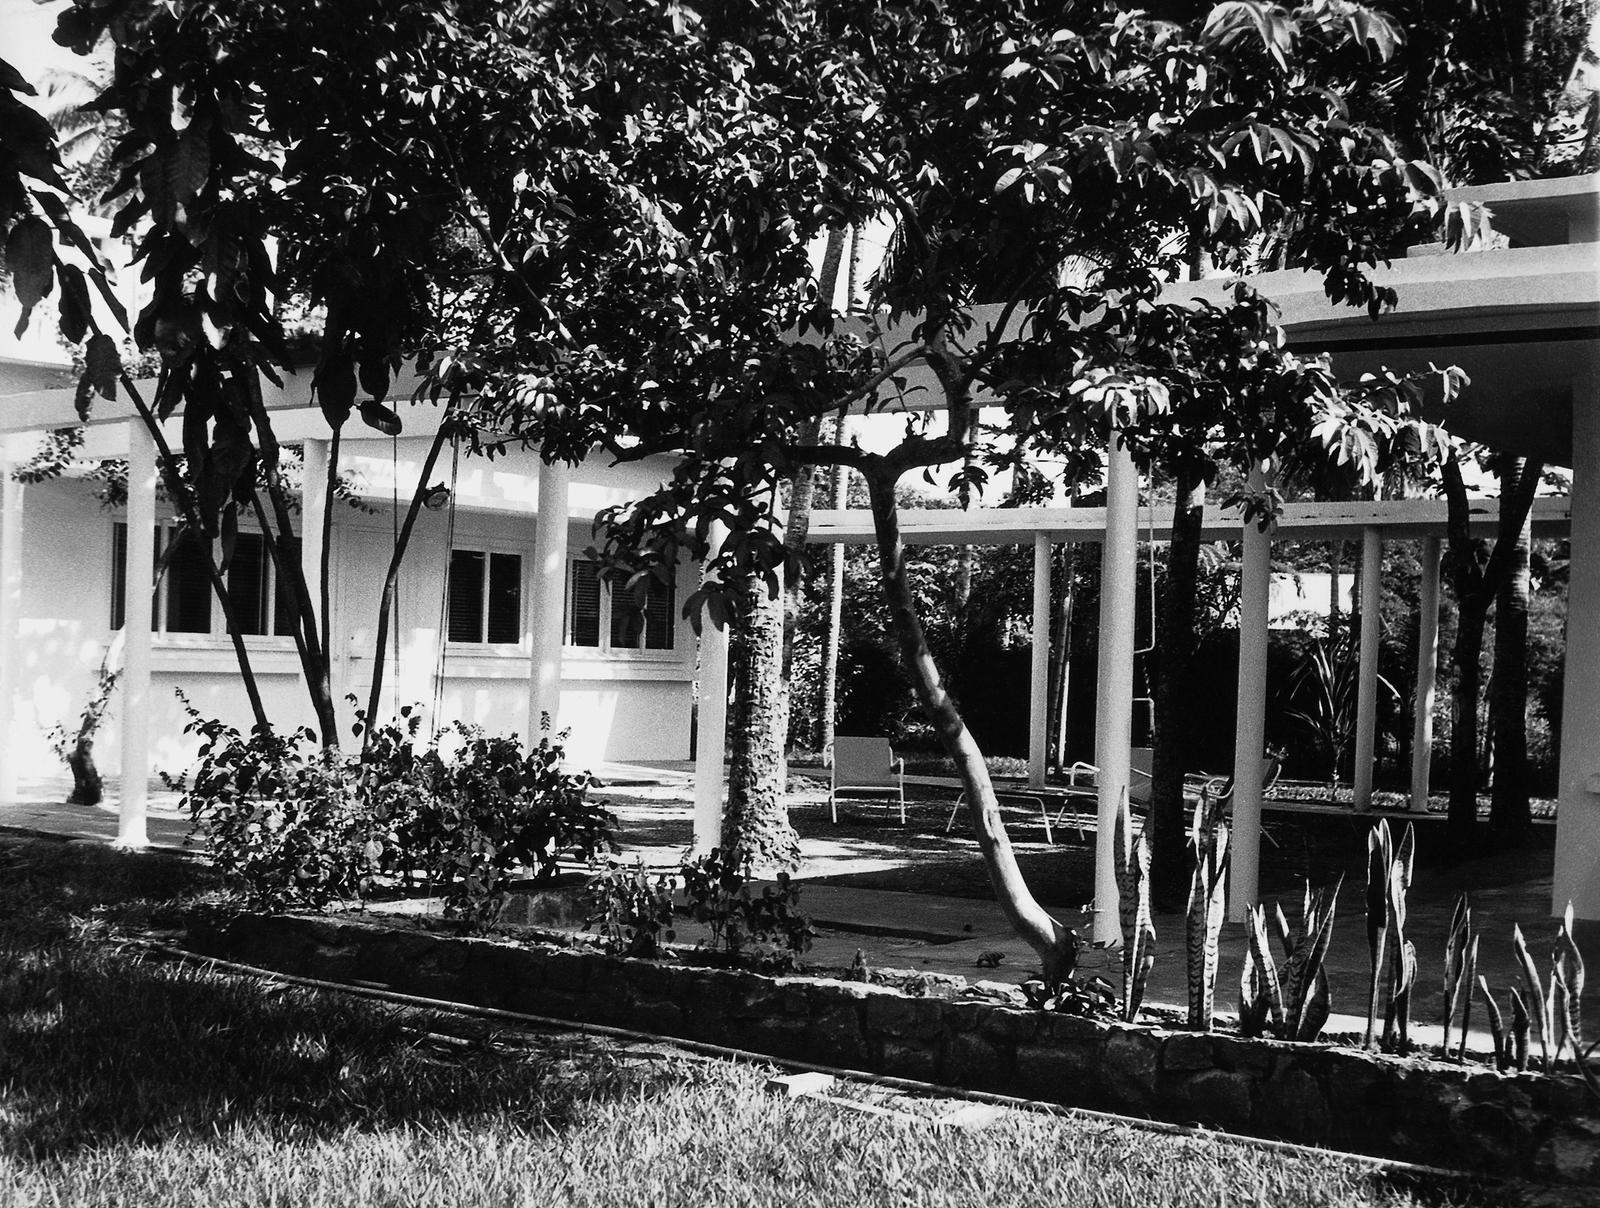 Brazzaville - Recreation/Community Center/Gym/Theater - 1961